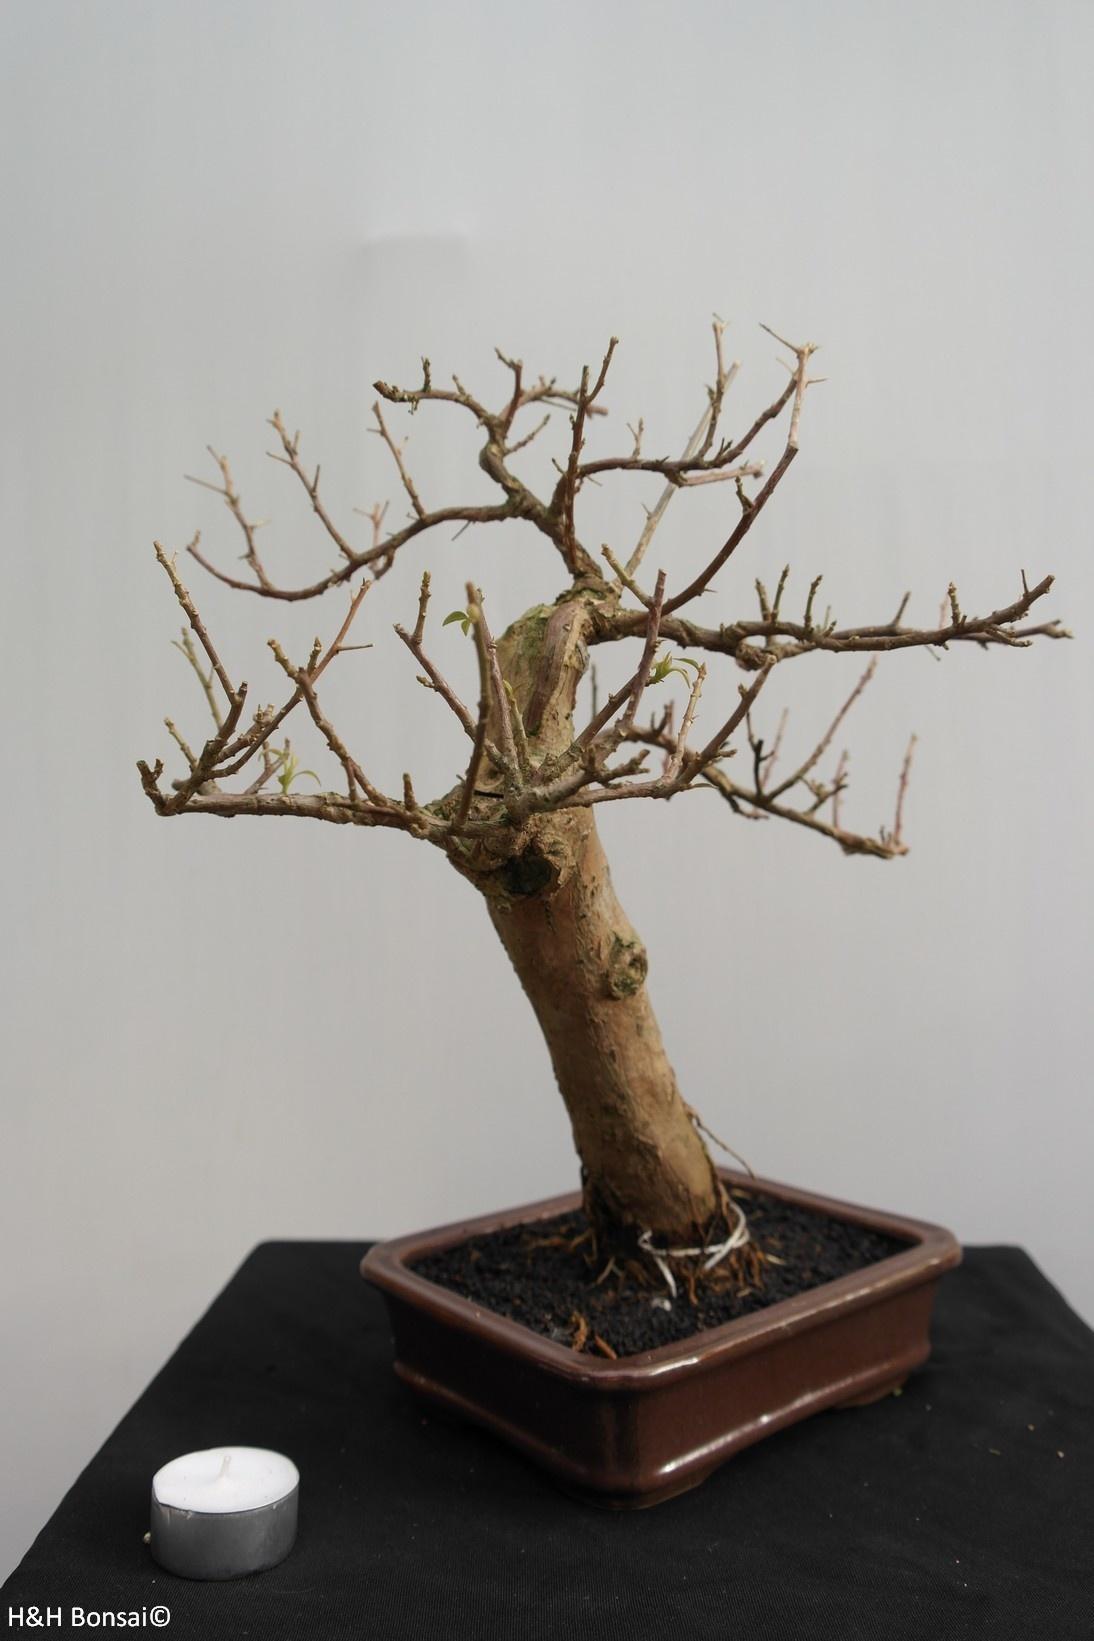 BonsaiBougainvillea glabra, nr. 7818